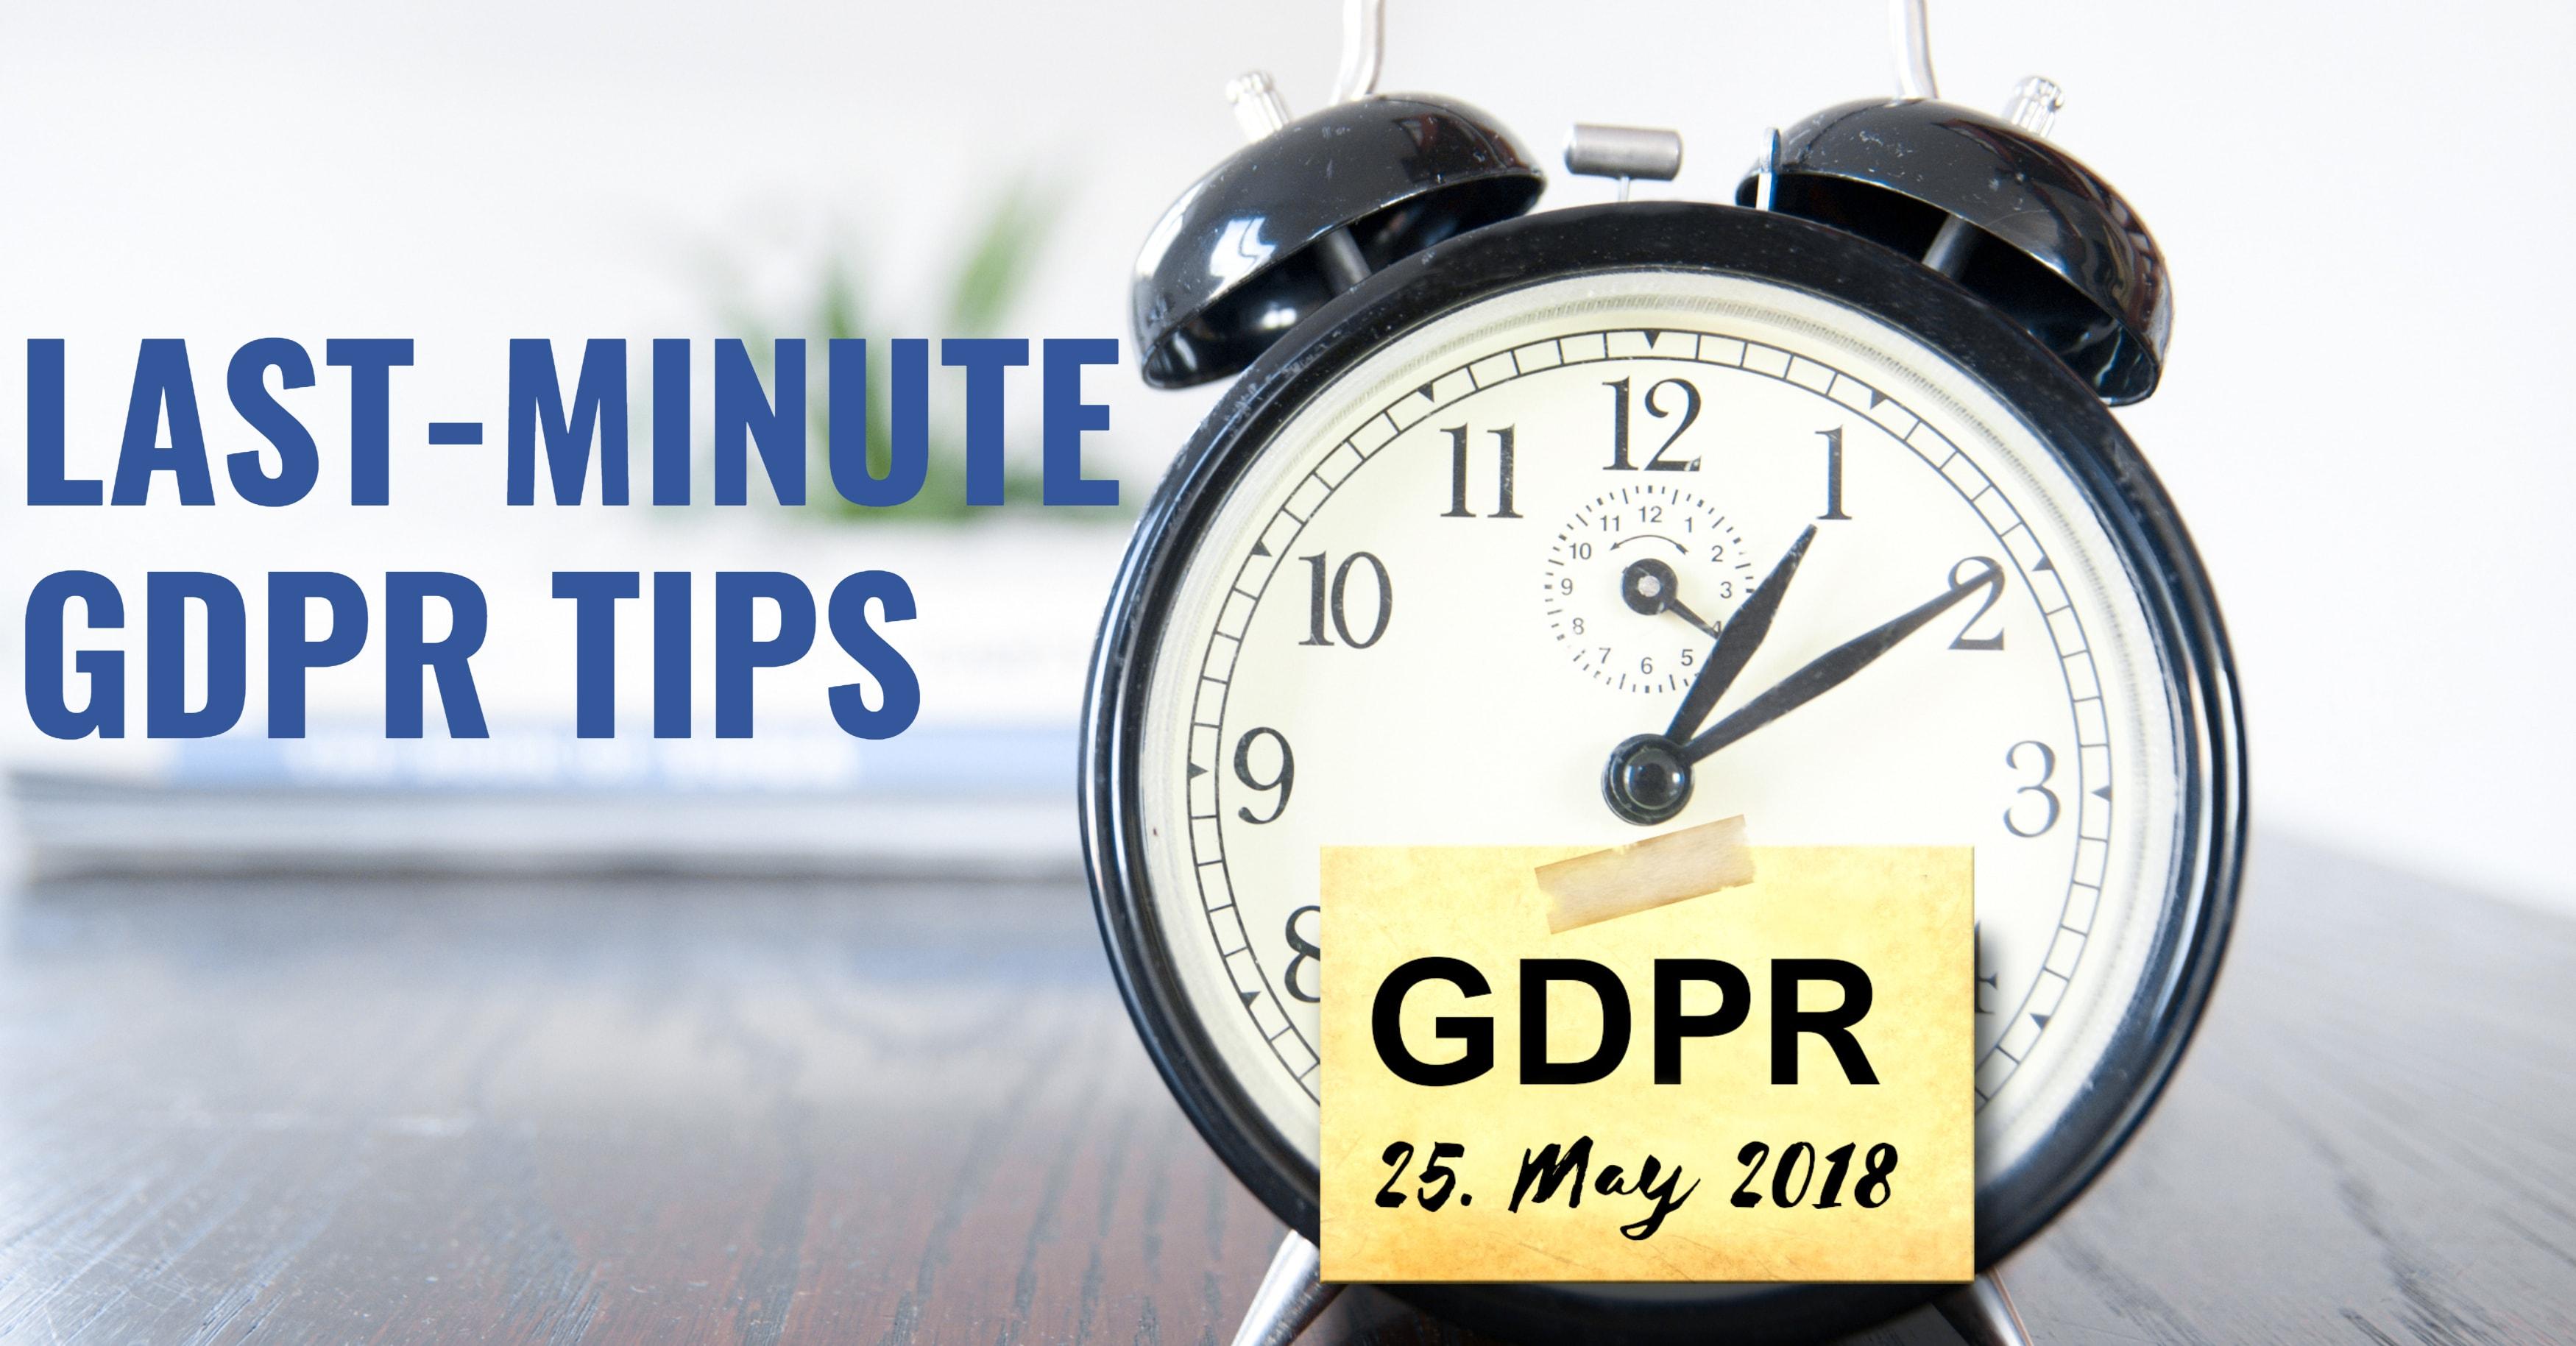 Last-Minute GDPR Tips